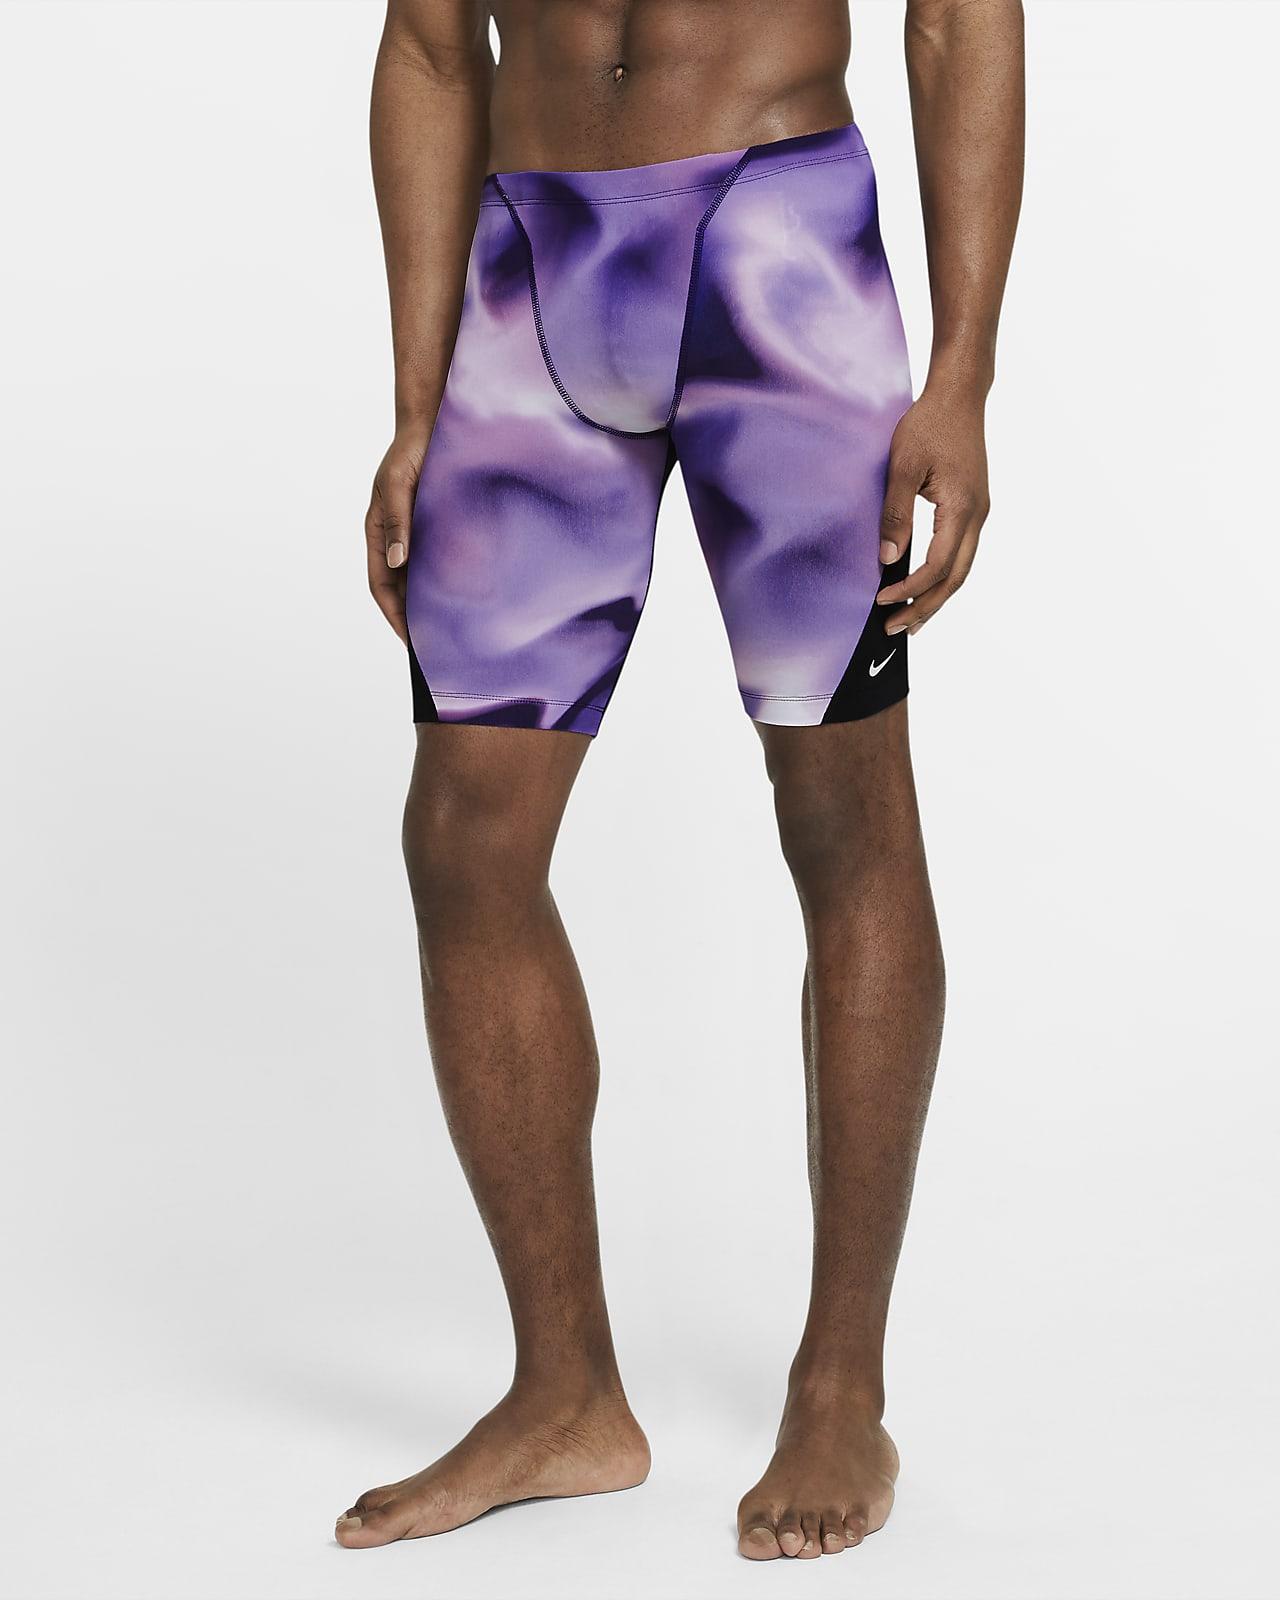 Nike Amp Axis Swim Jammer